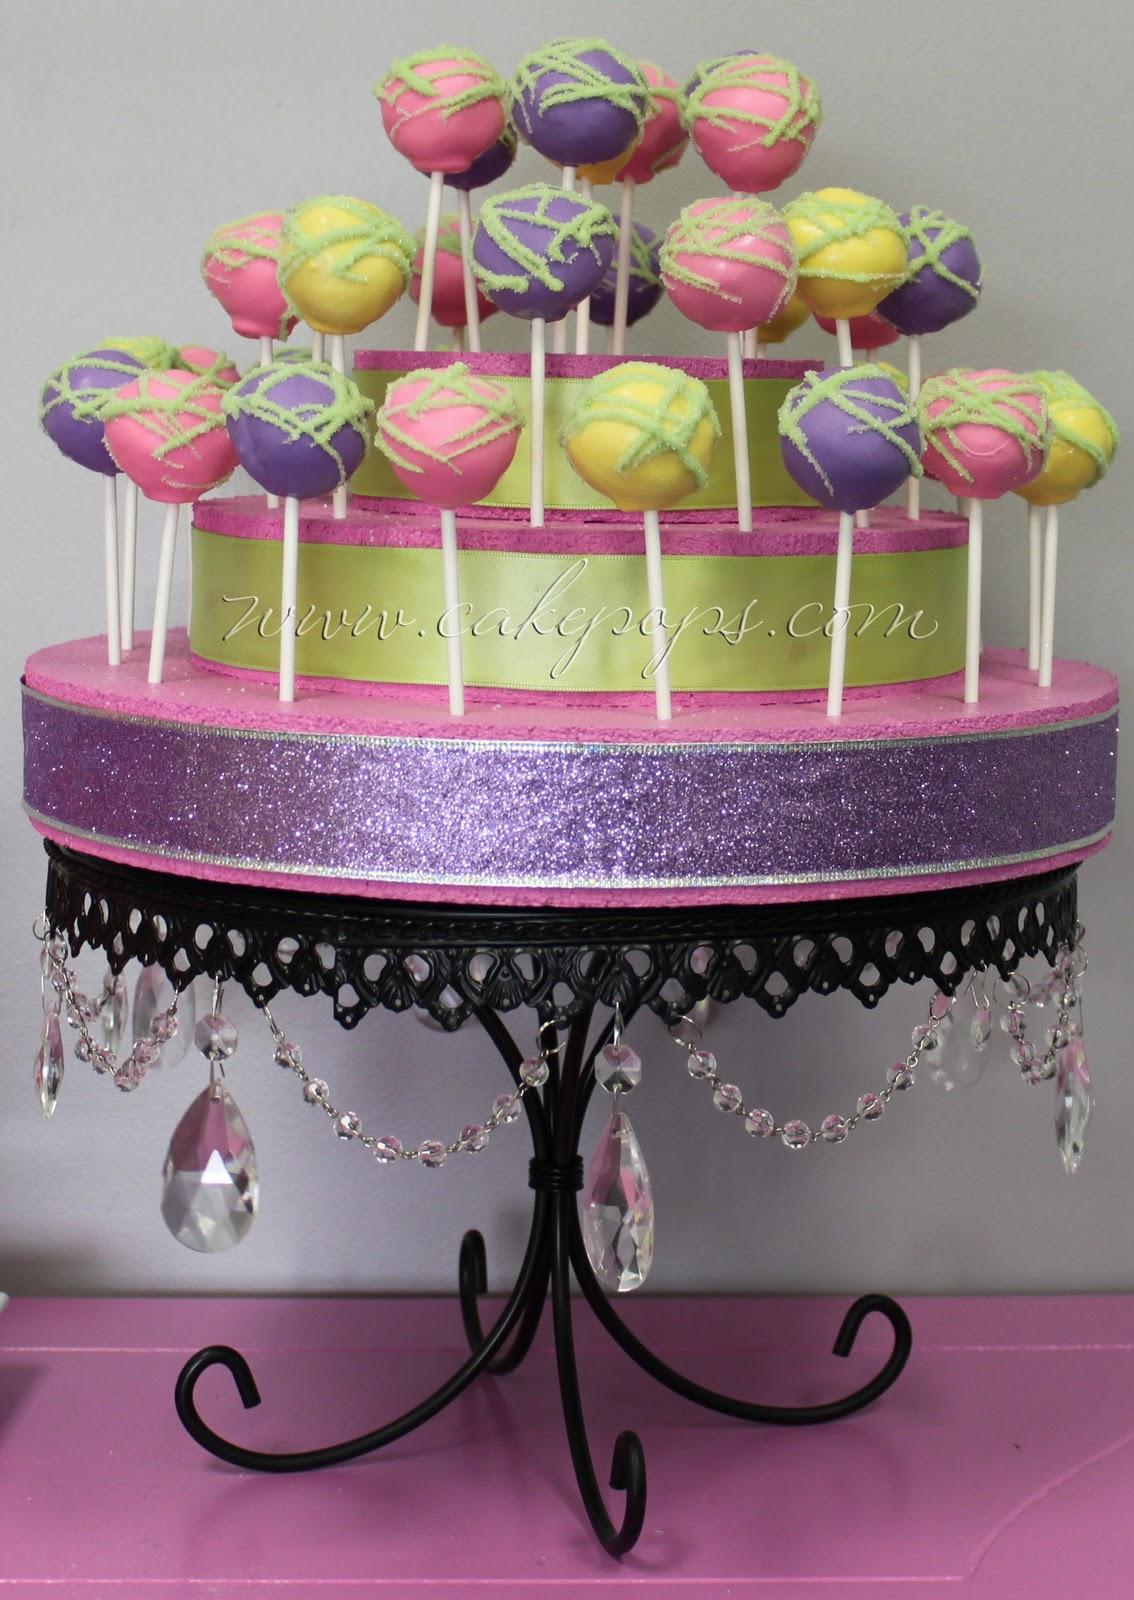 Delycidades Como Hacer Bases Para Cake Pops